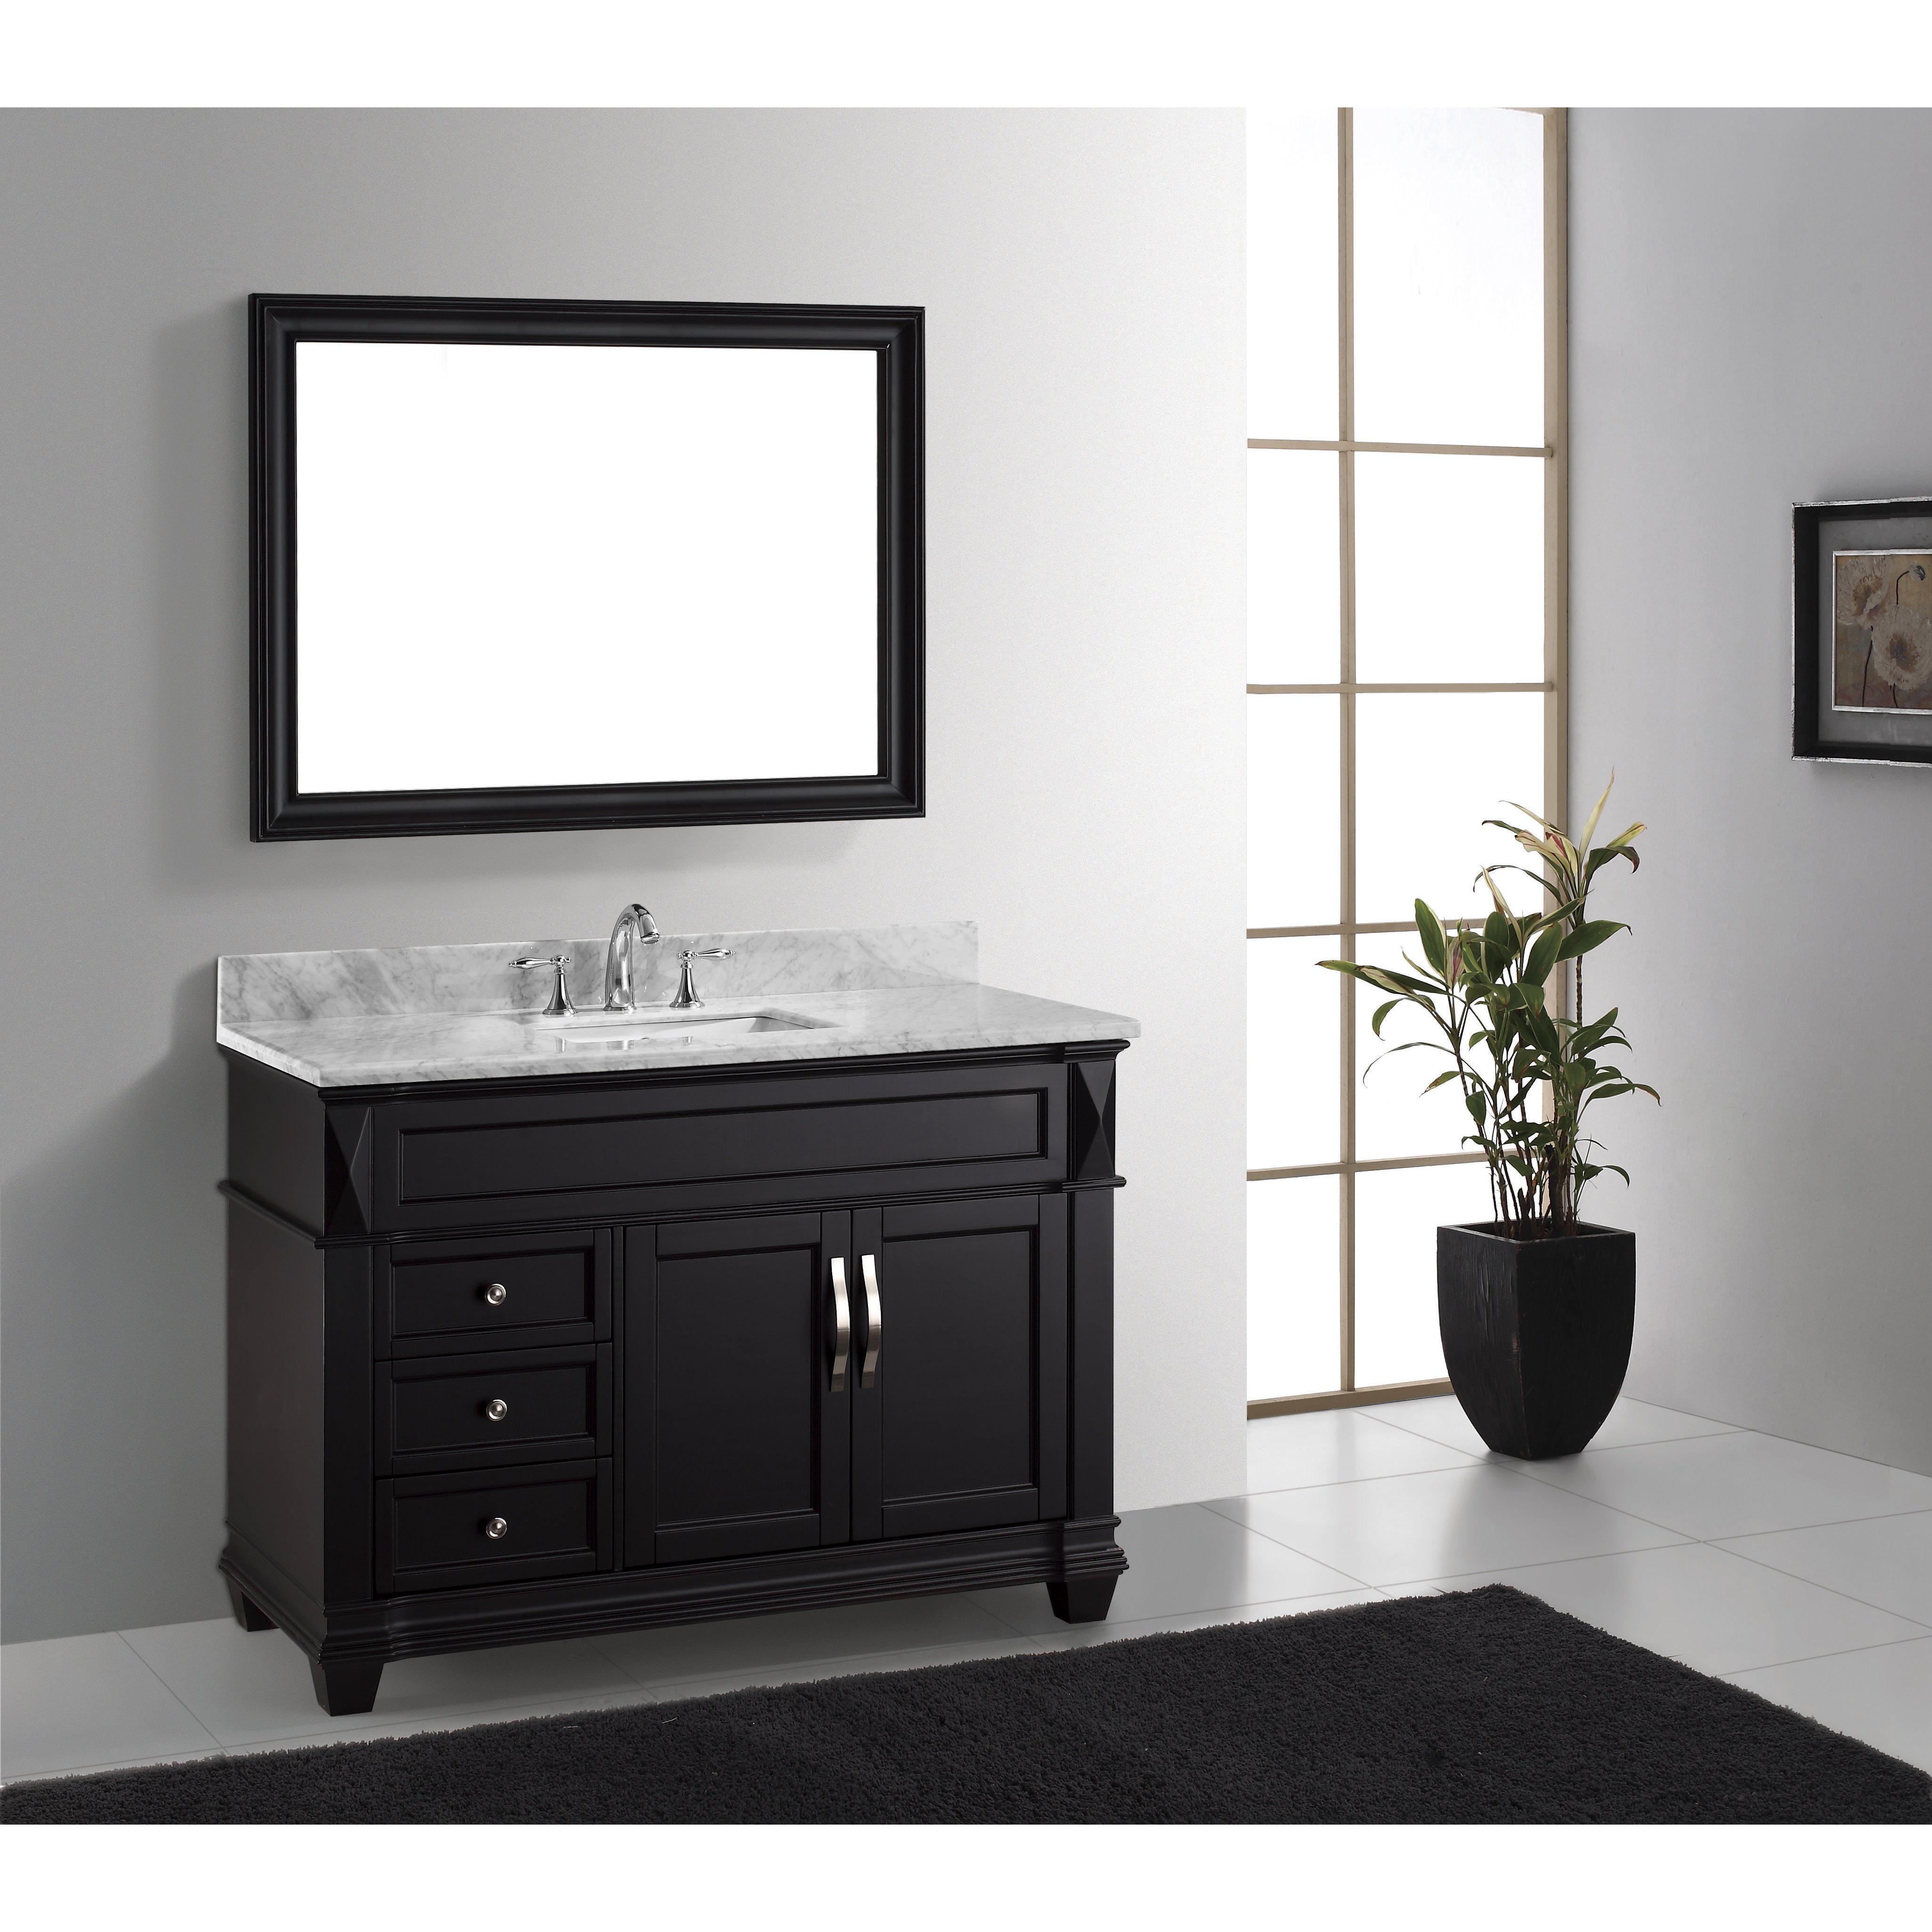 fantastic bathroom vanity decor photograph-Inspirational Bathroom Vanity Decor Model